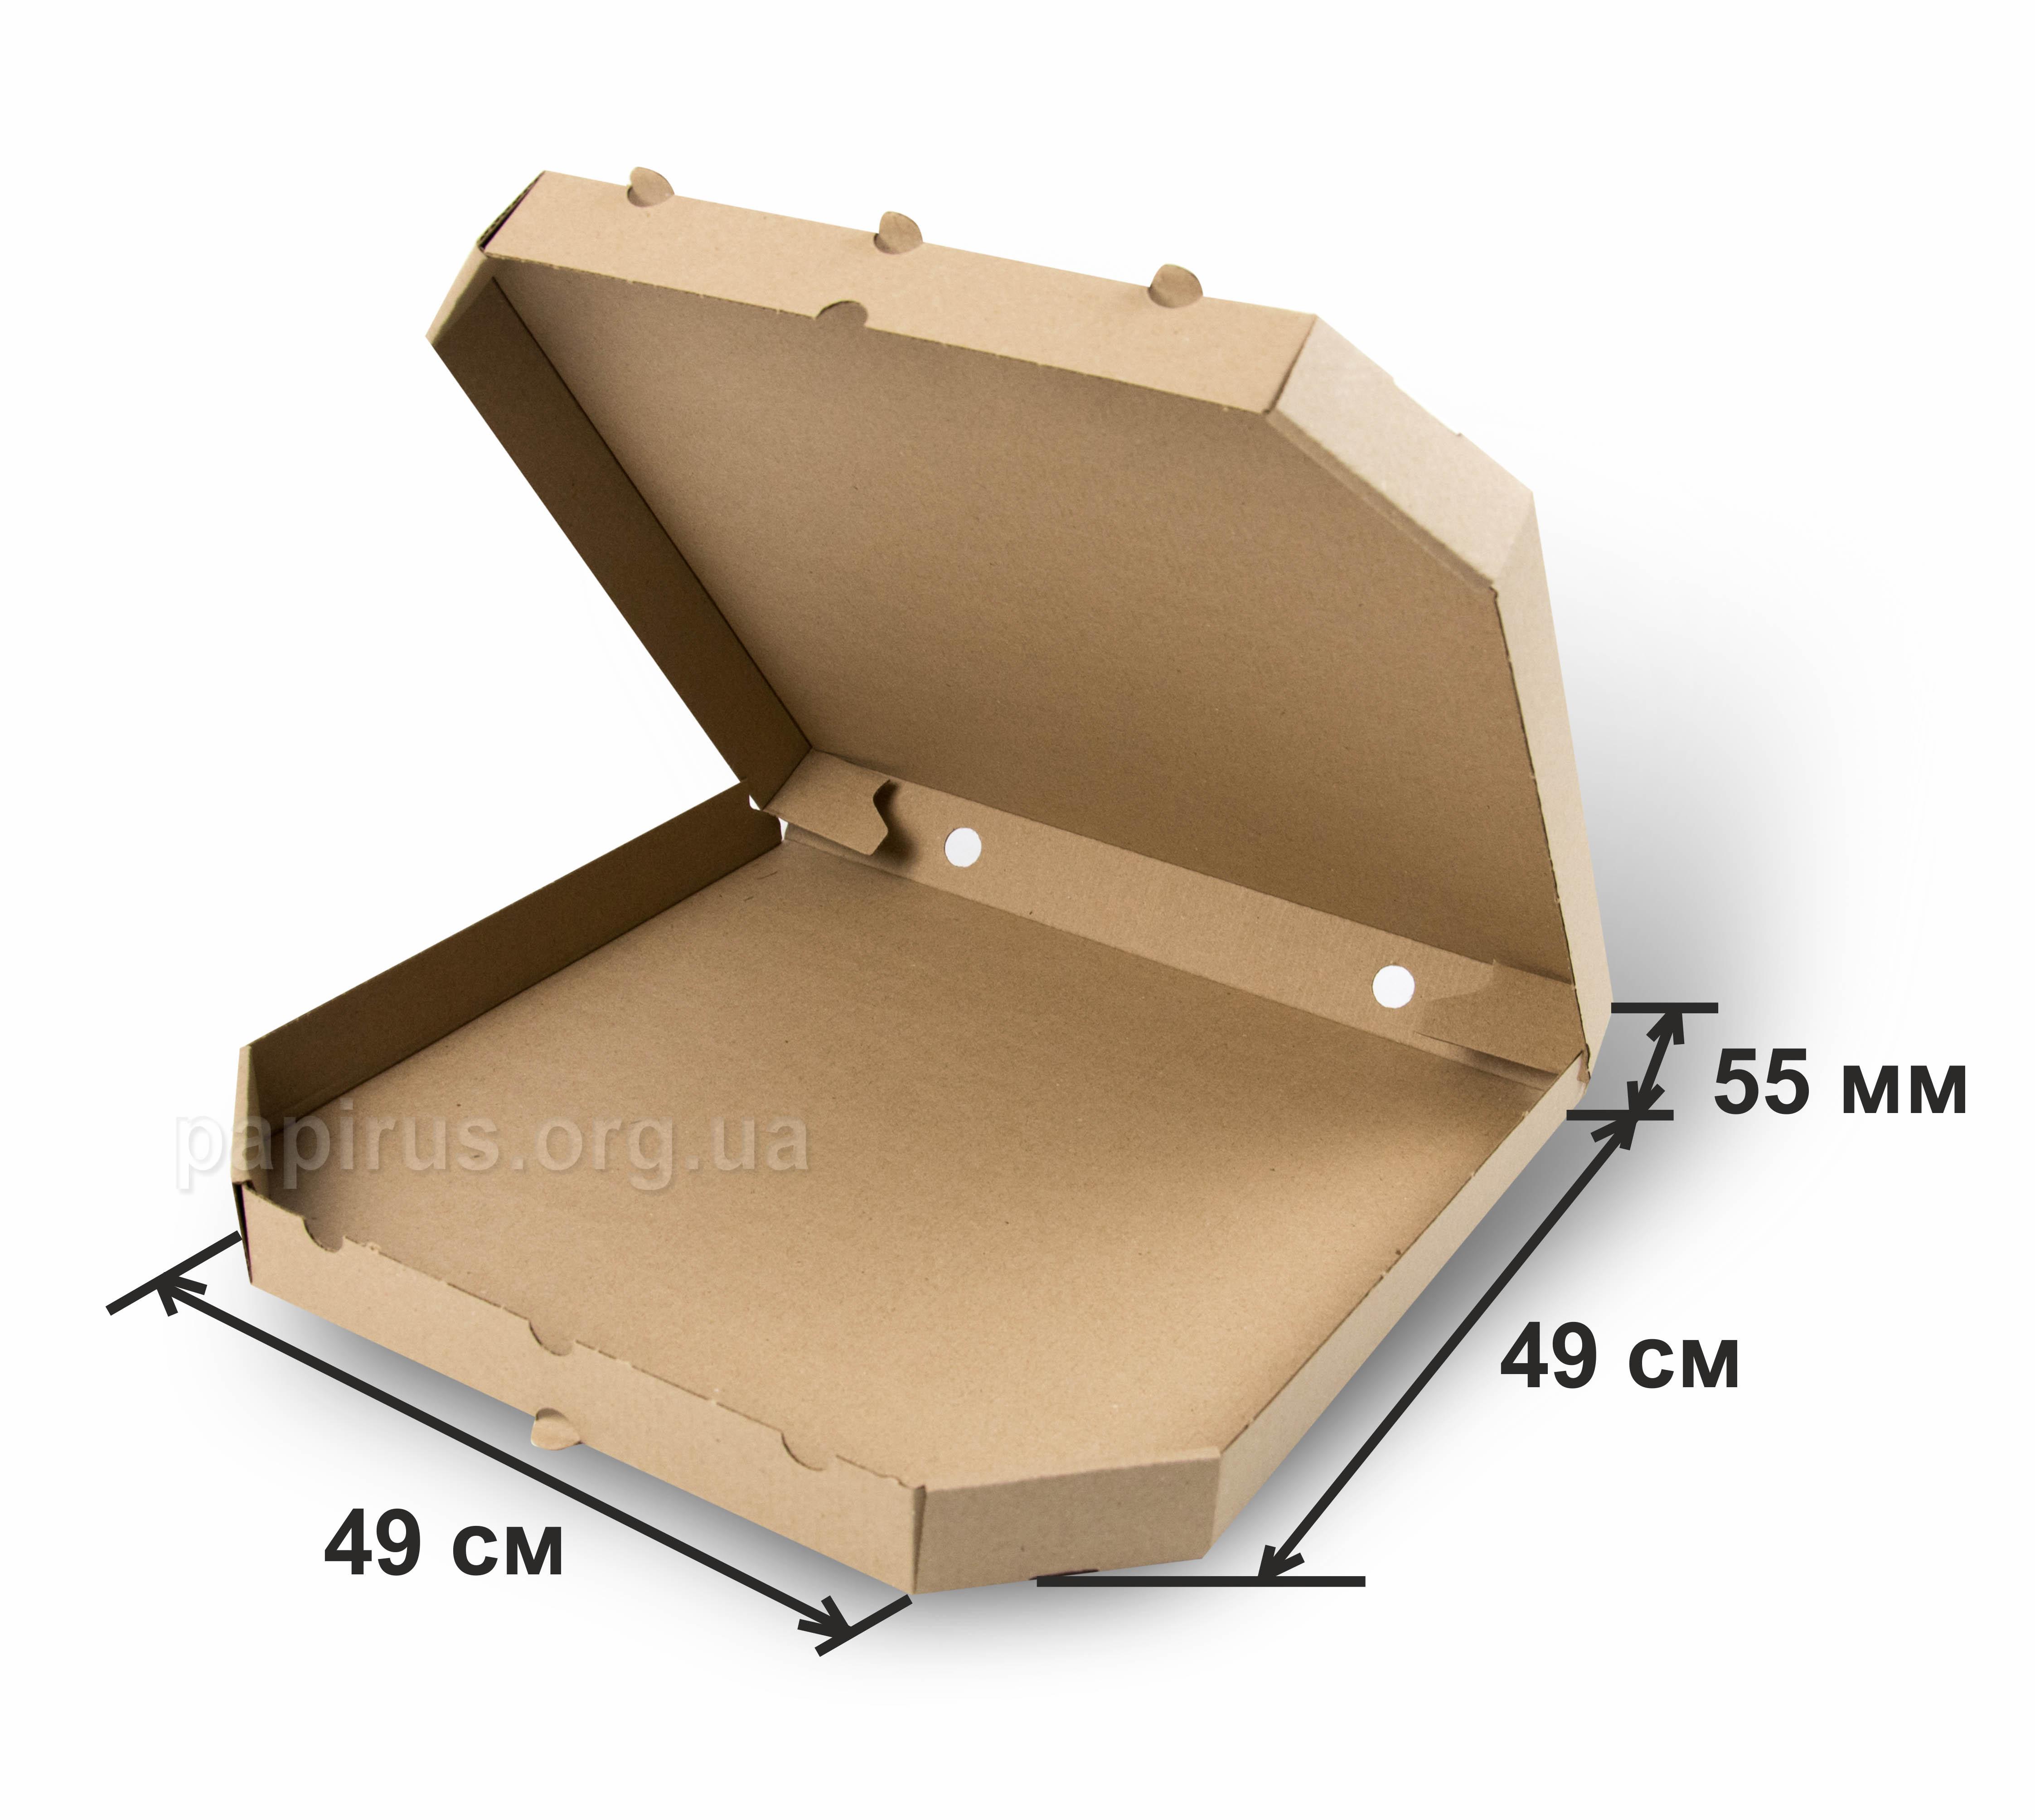 Коробка для пиццы бурая 490х490, г.Сумы, Типография Папирус